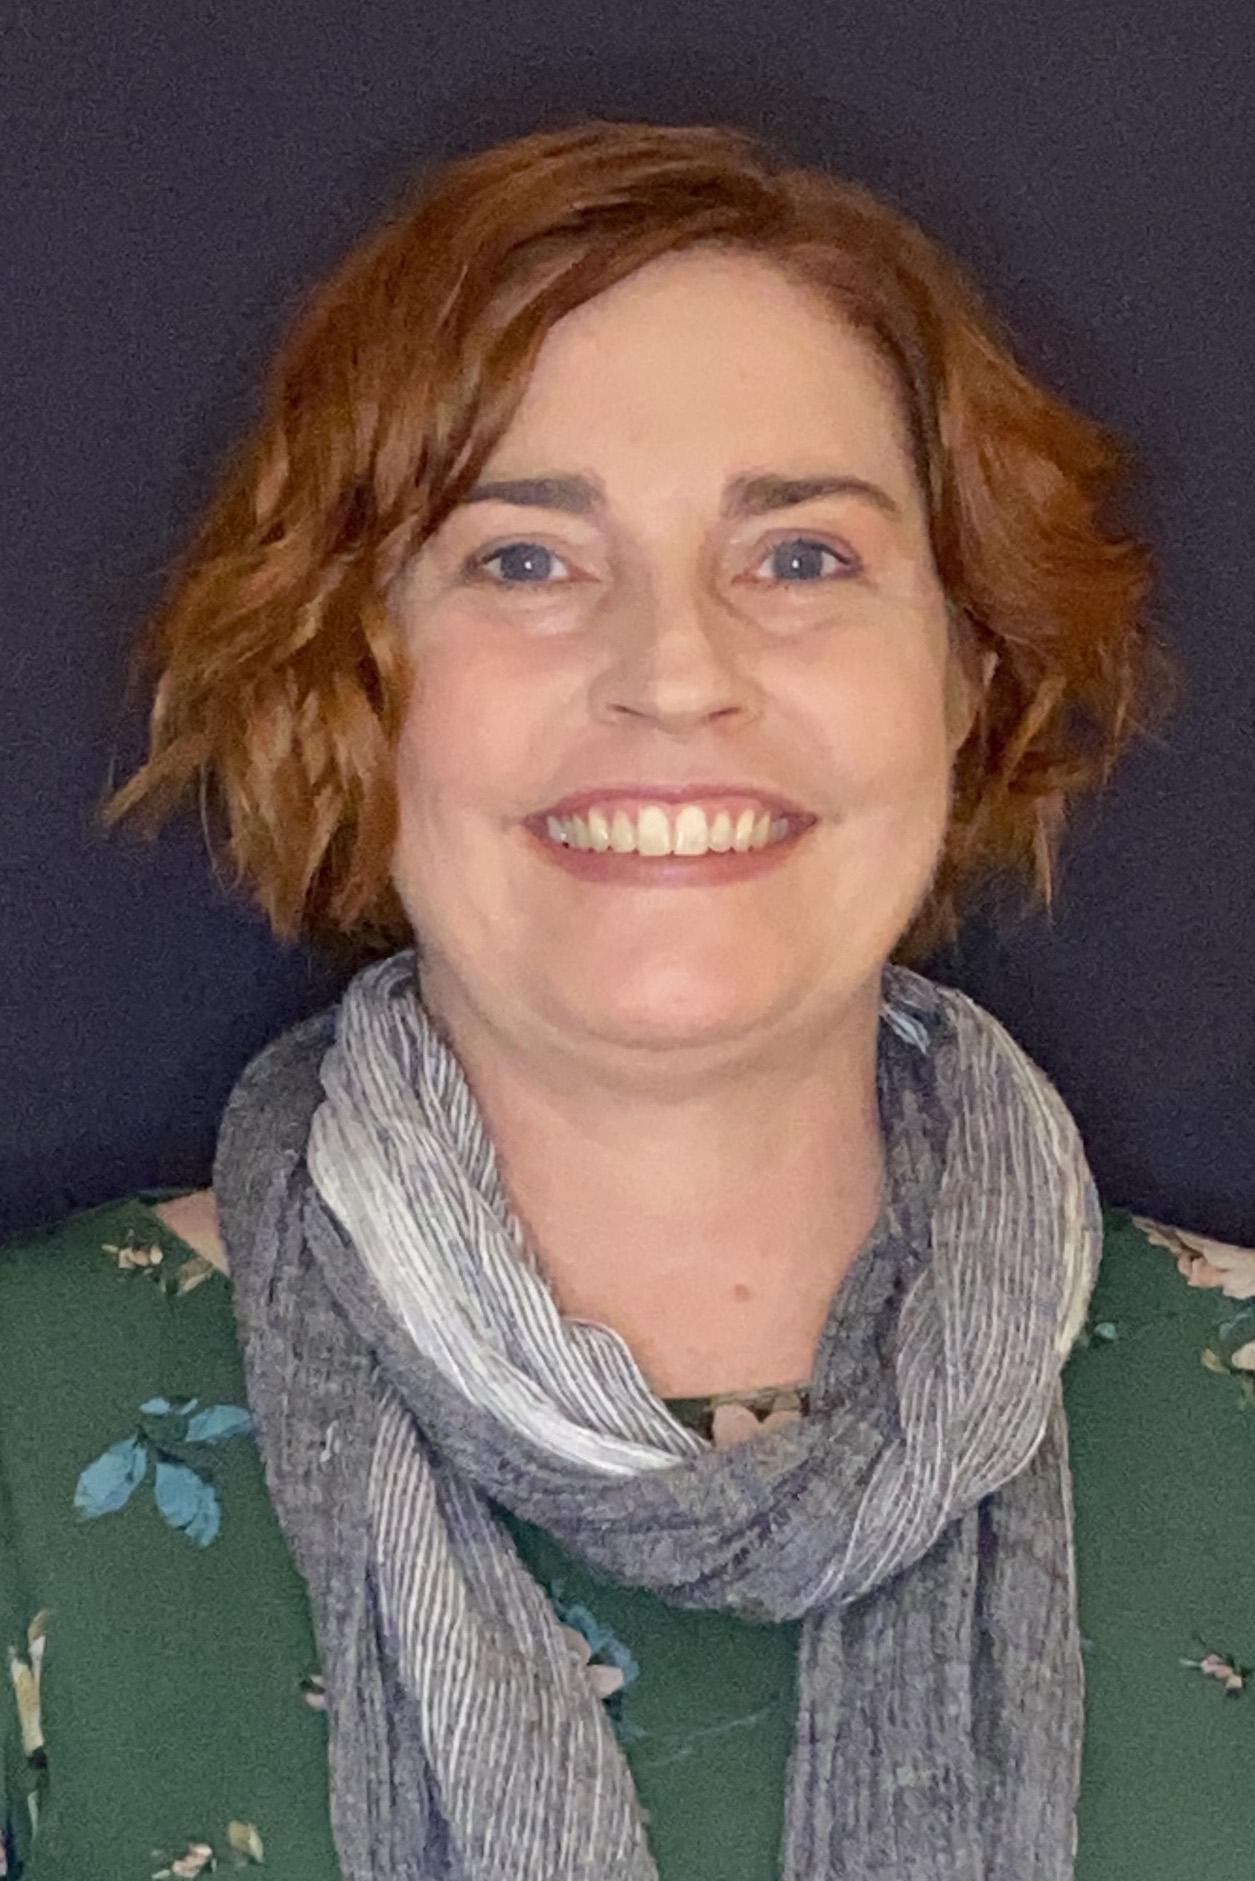 Tara Fox portrait